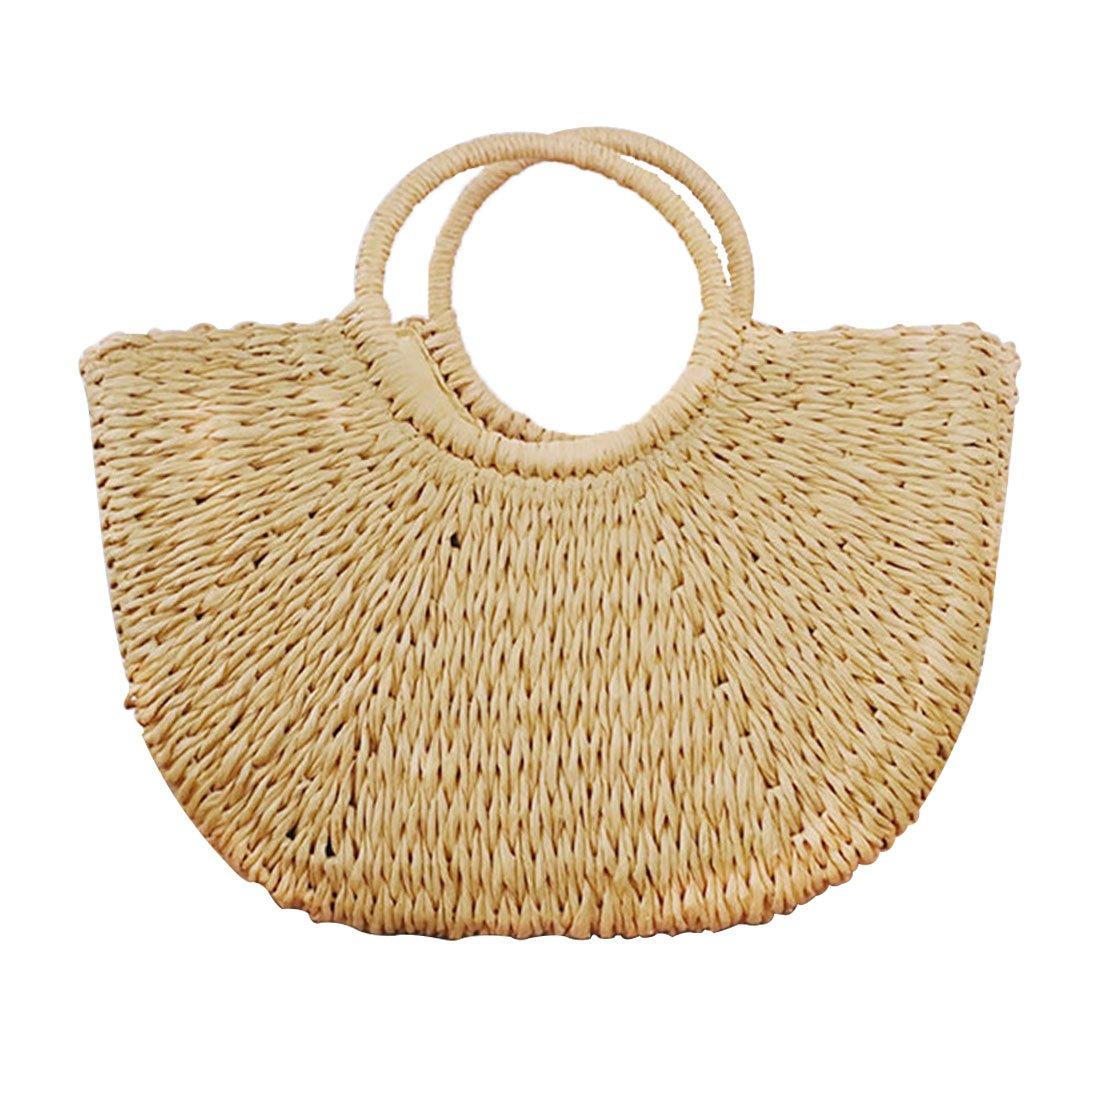 Hand-woven Straw Large Hobo Bag for Women Round Handle Ring Toto Retro Summer Beach (Khaki)